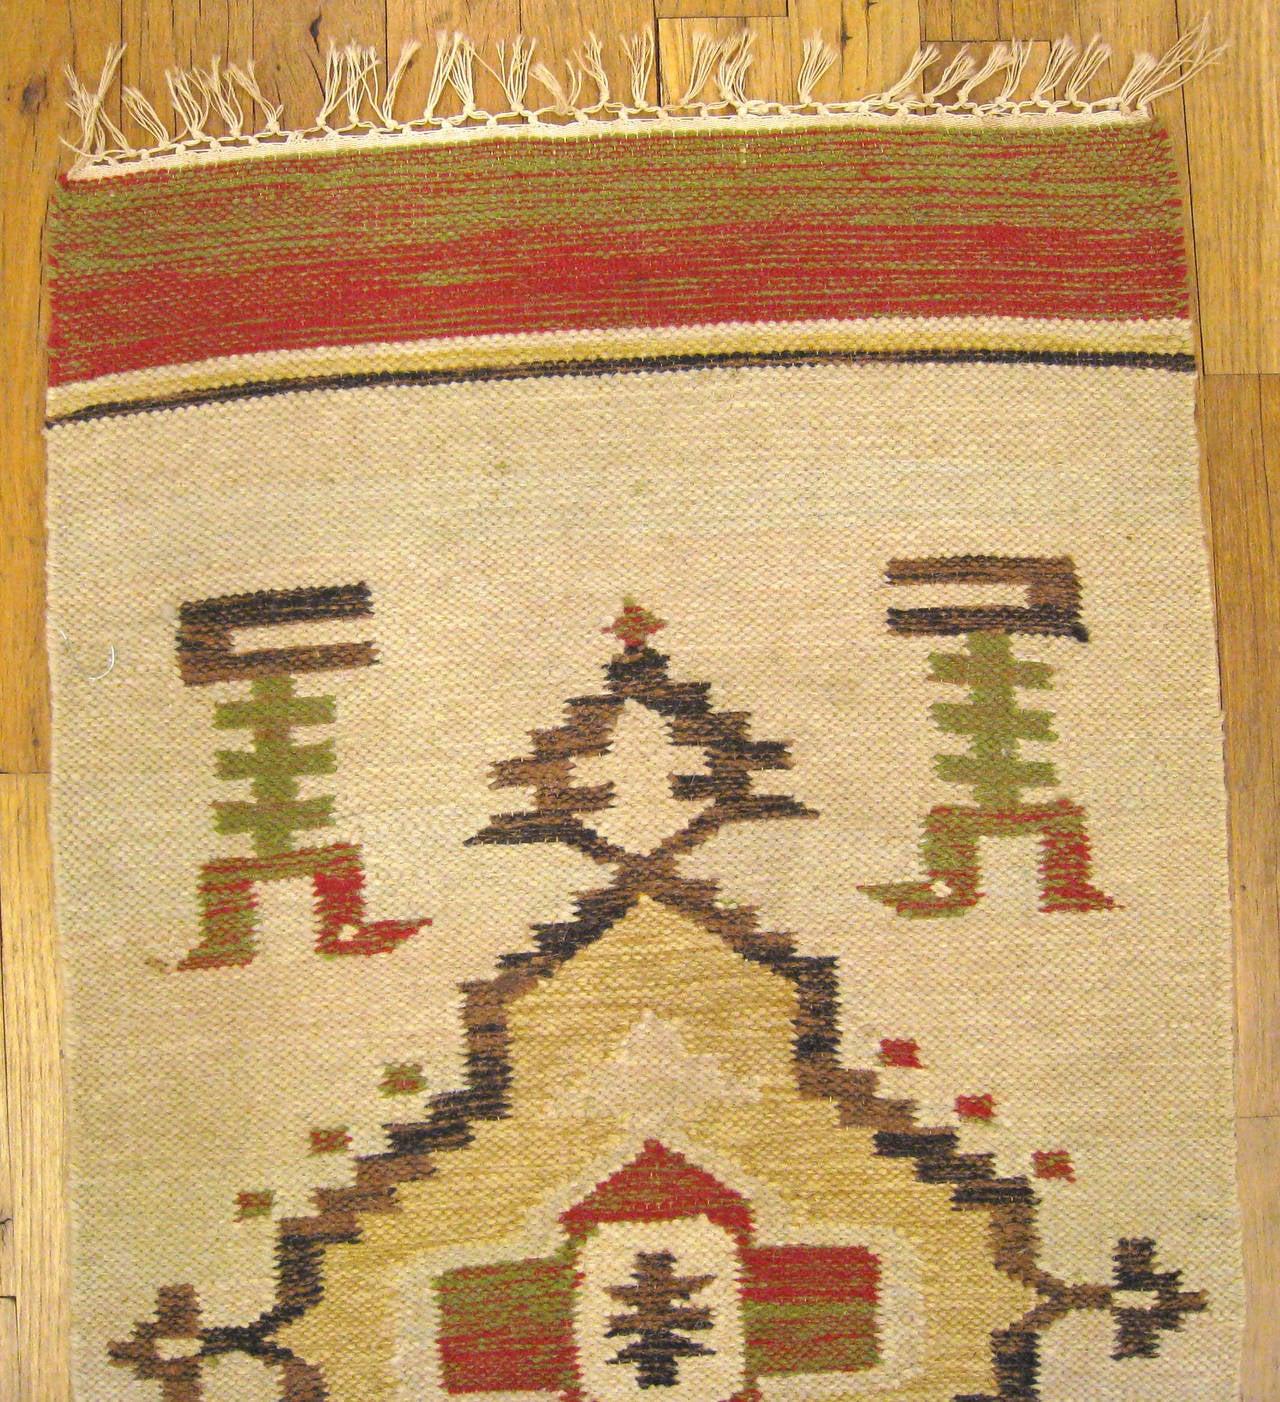 Vintage Mexican Zapotec Decorative Carpet, In Small Size W